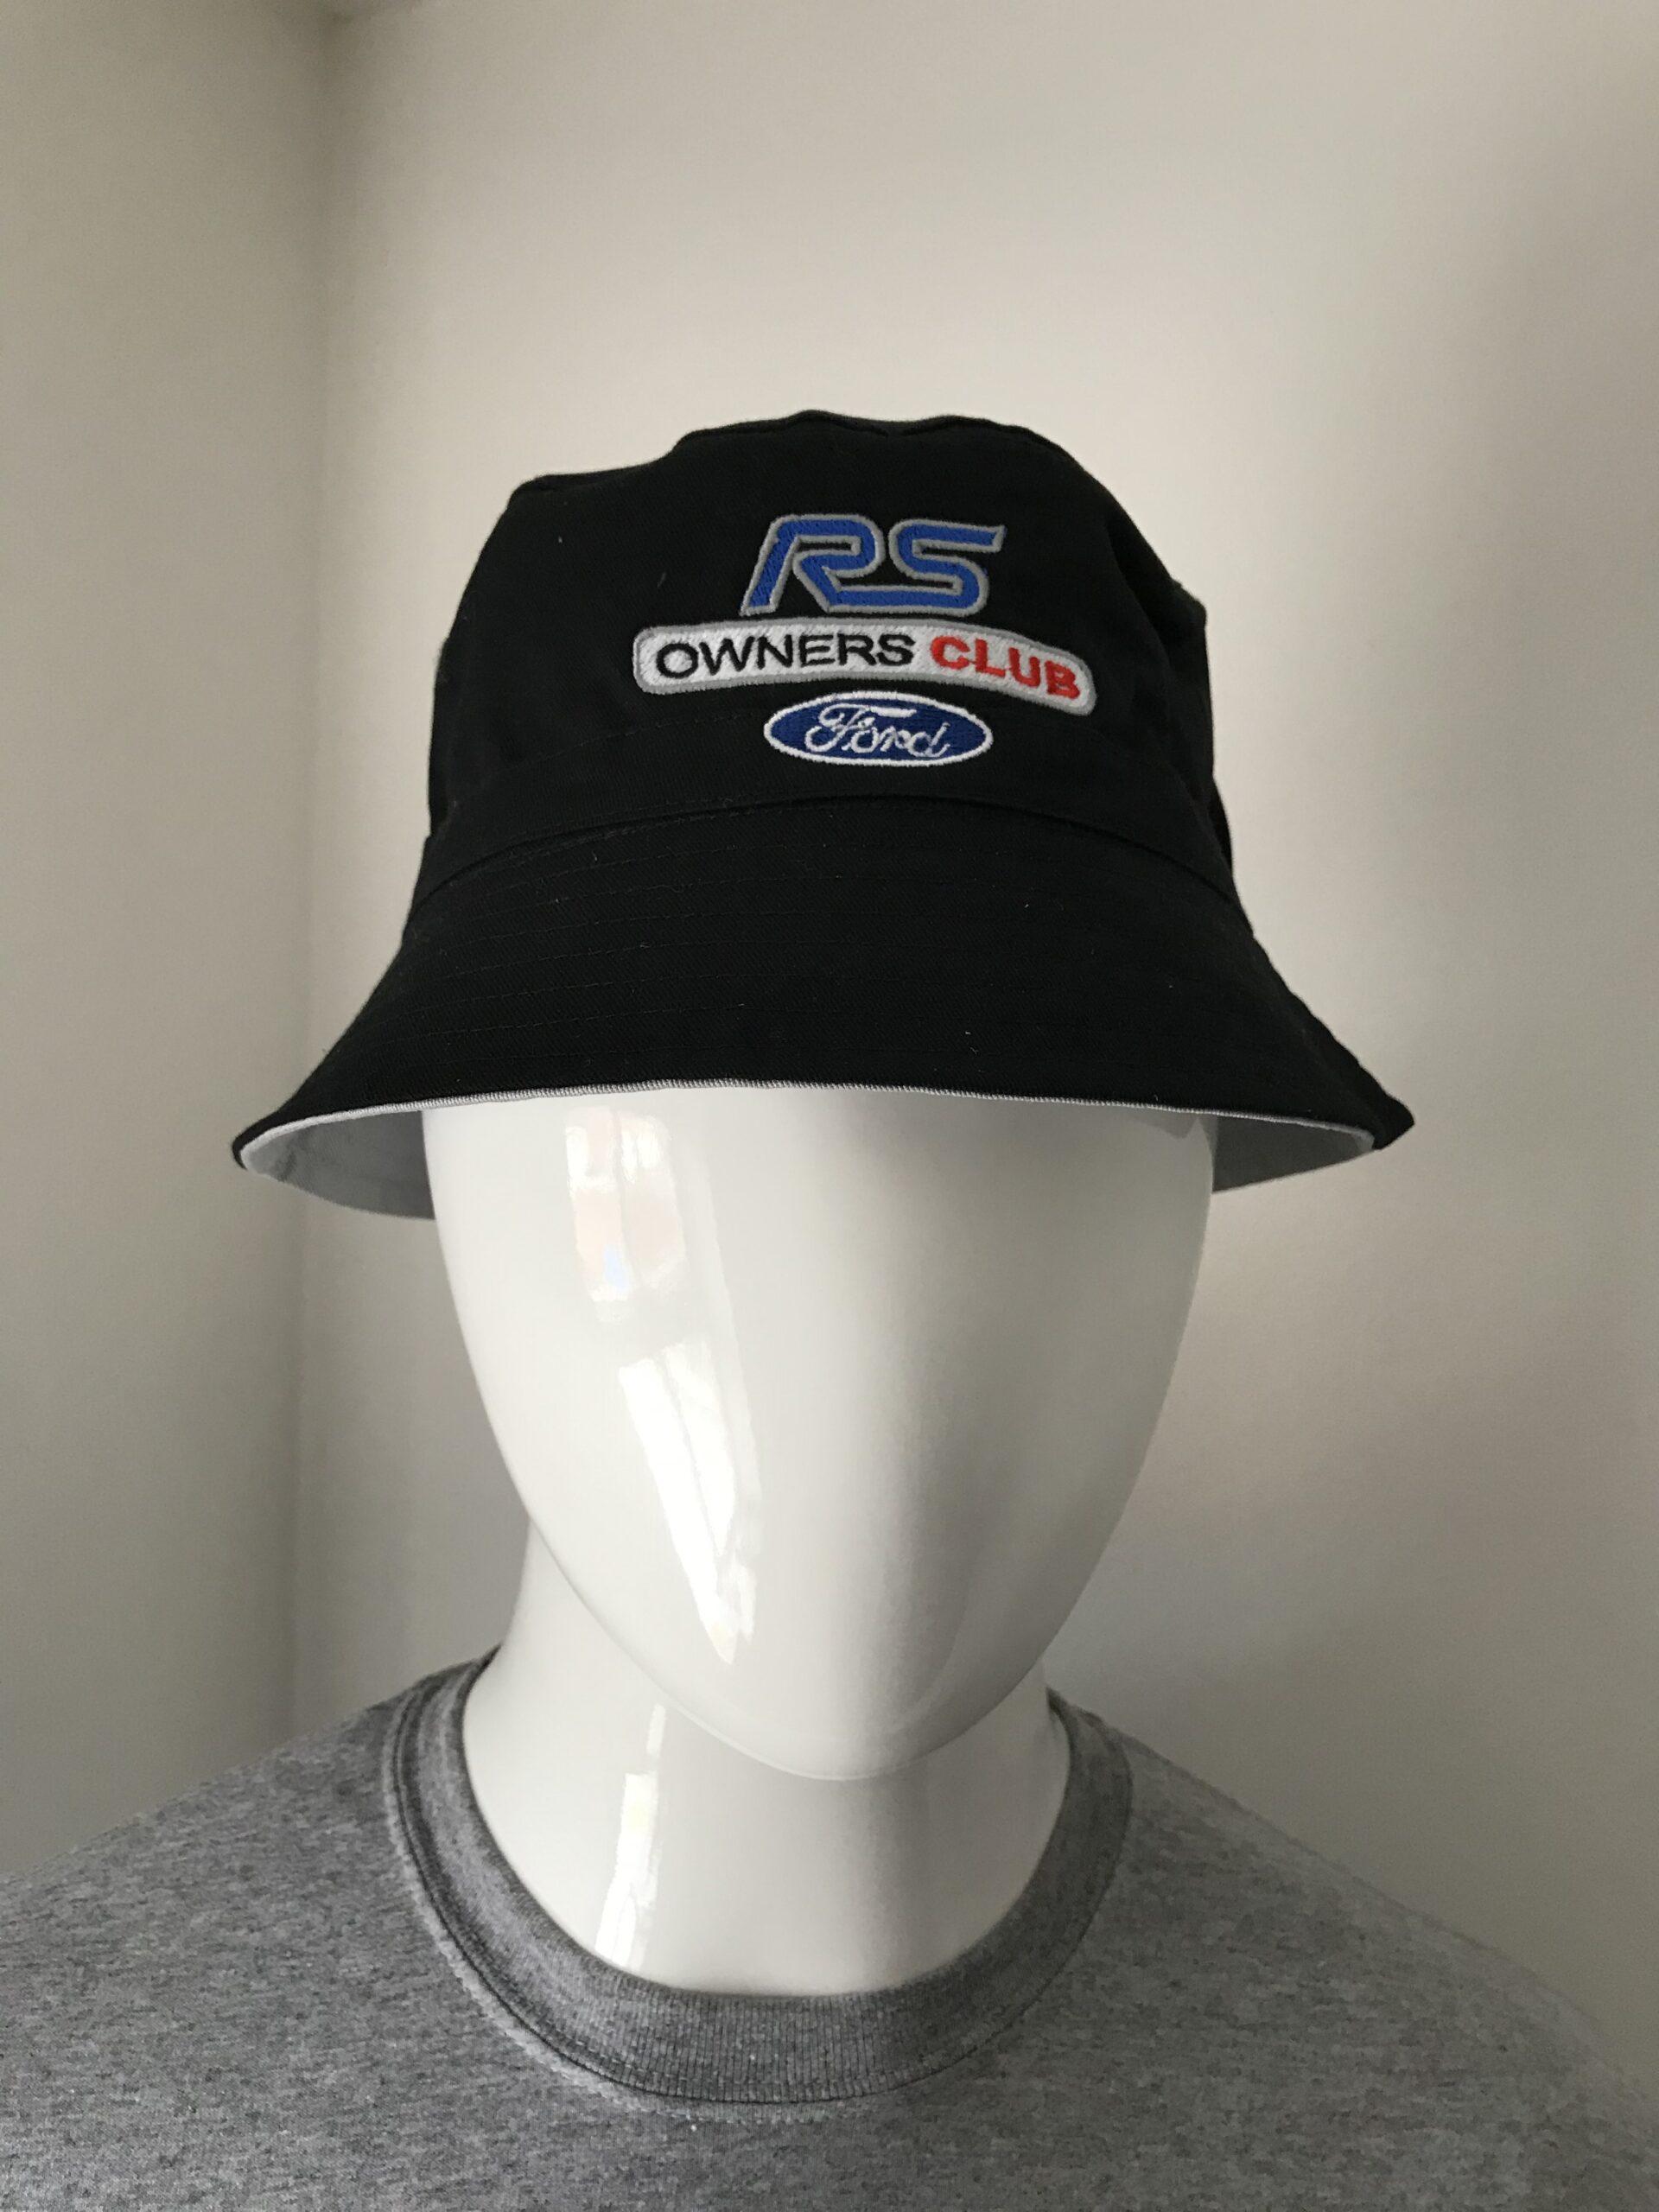 RSOC Hat